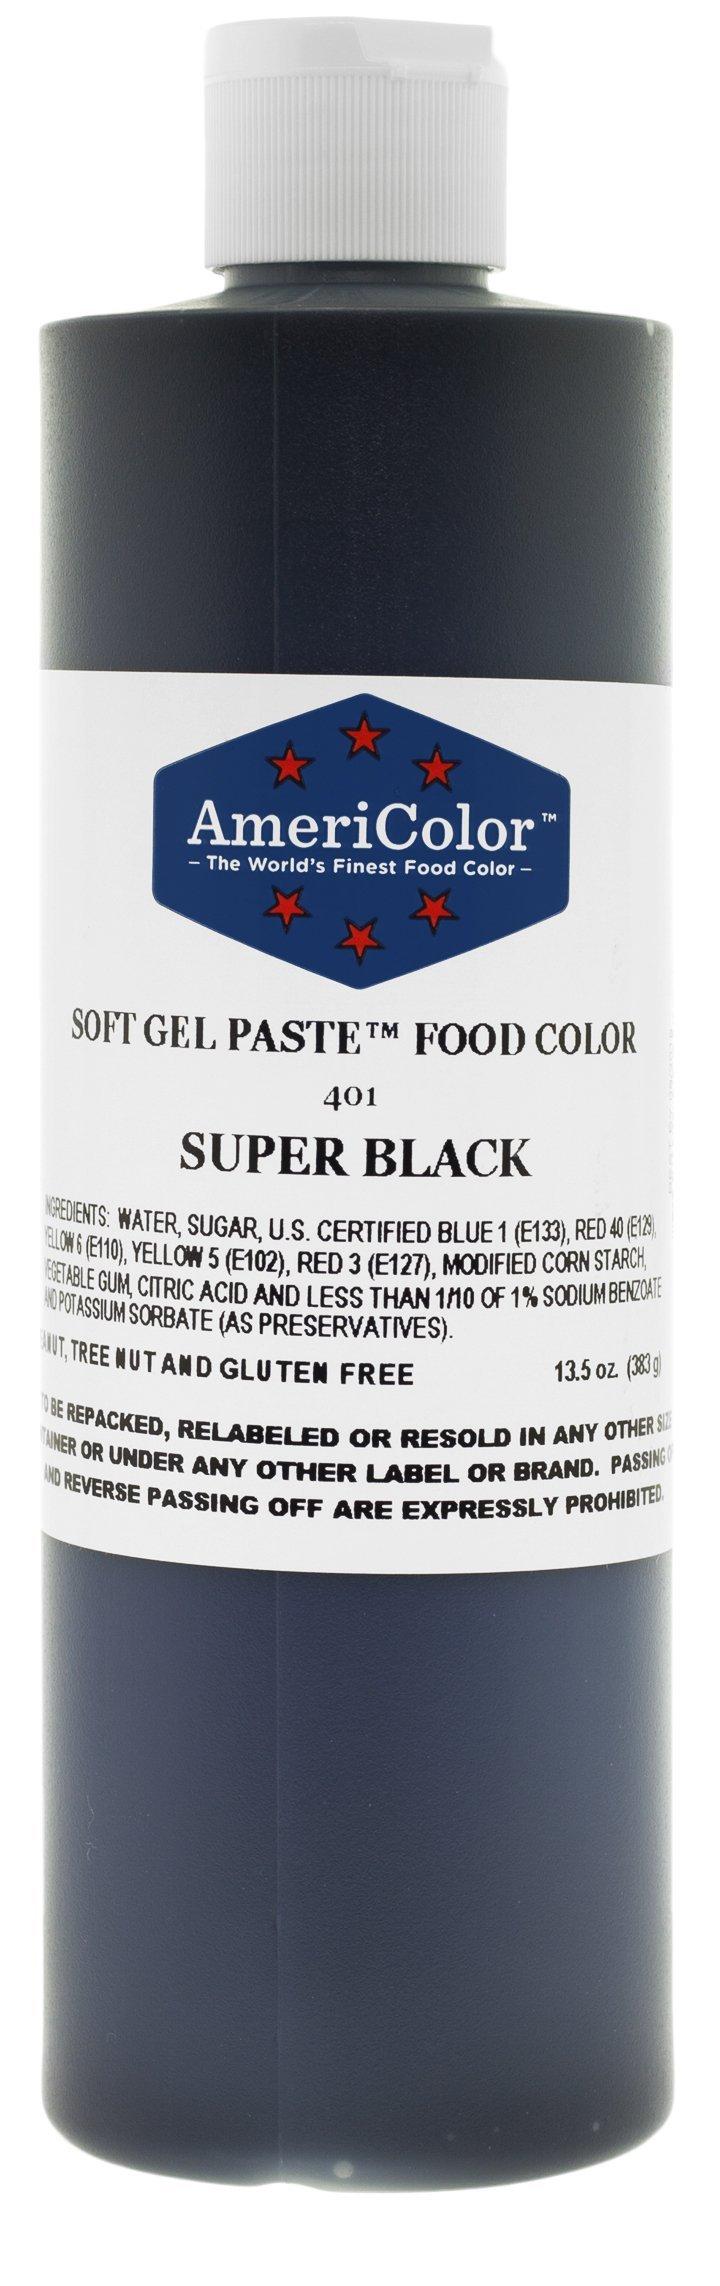 AmeriColor Soft Gel Paste Food Color, 13.5-Ounce, Super Black